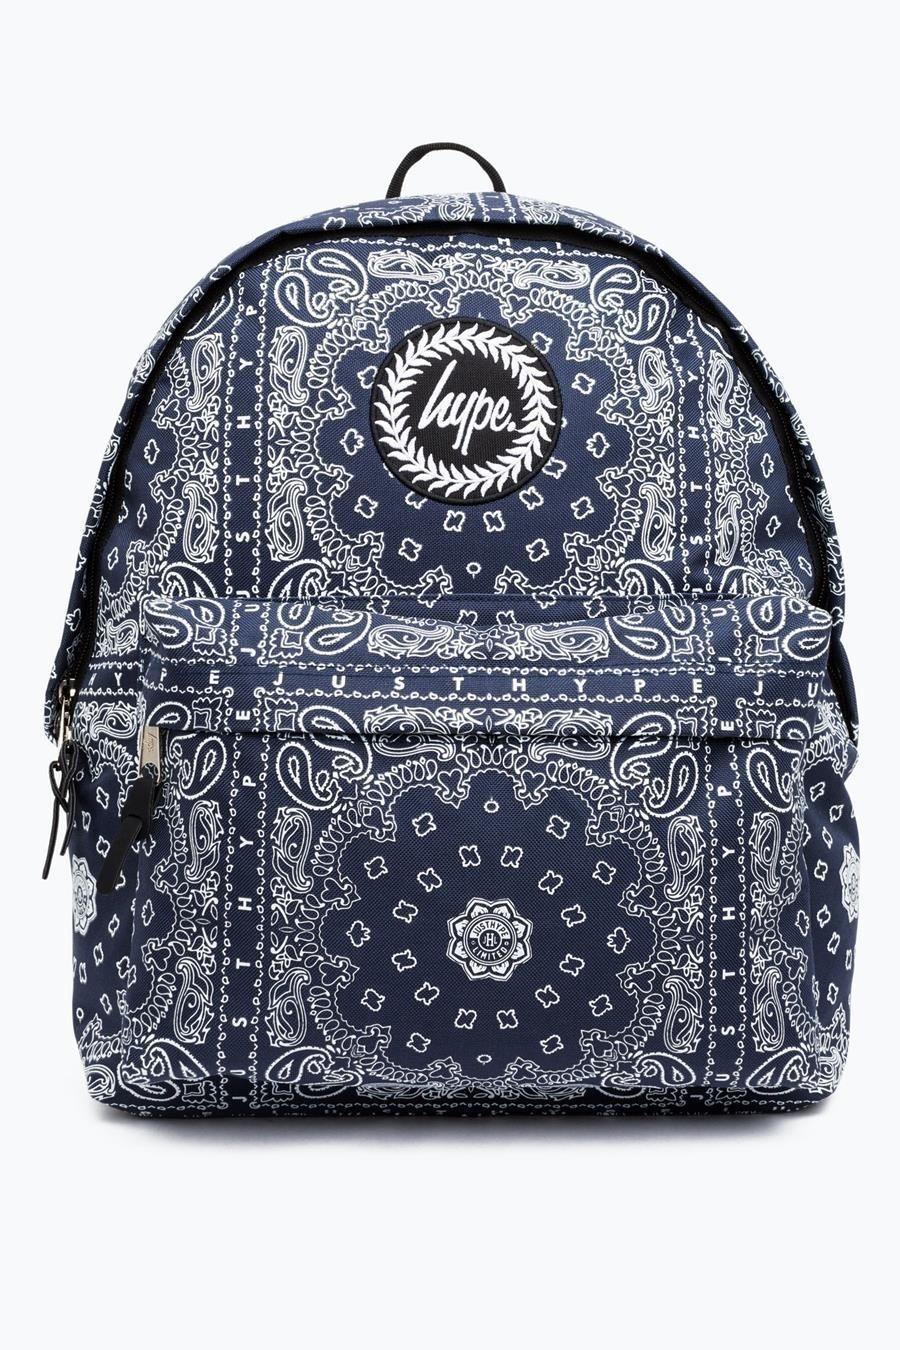 HYPE Navy/White Bandana Backpack